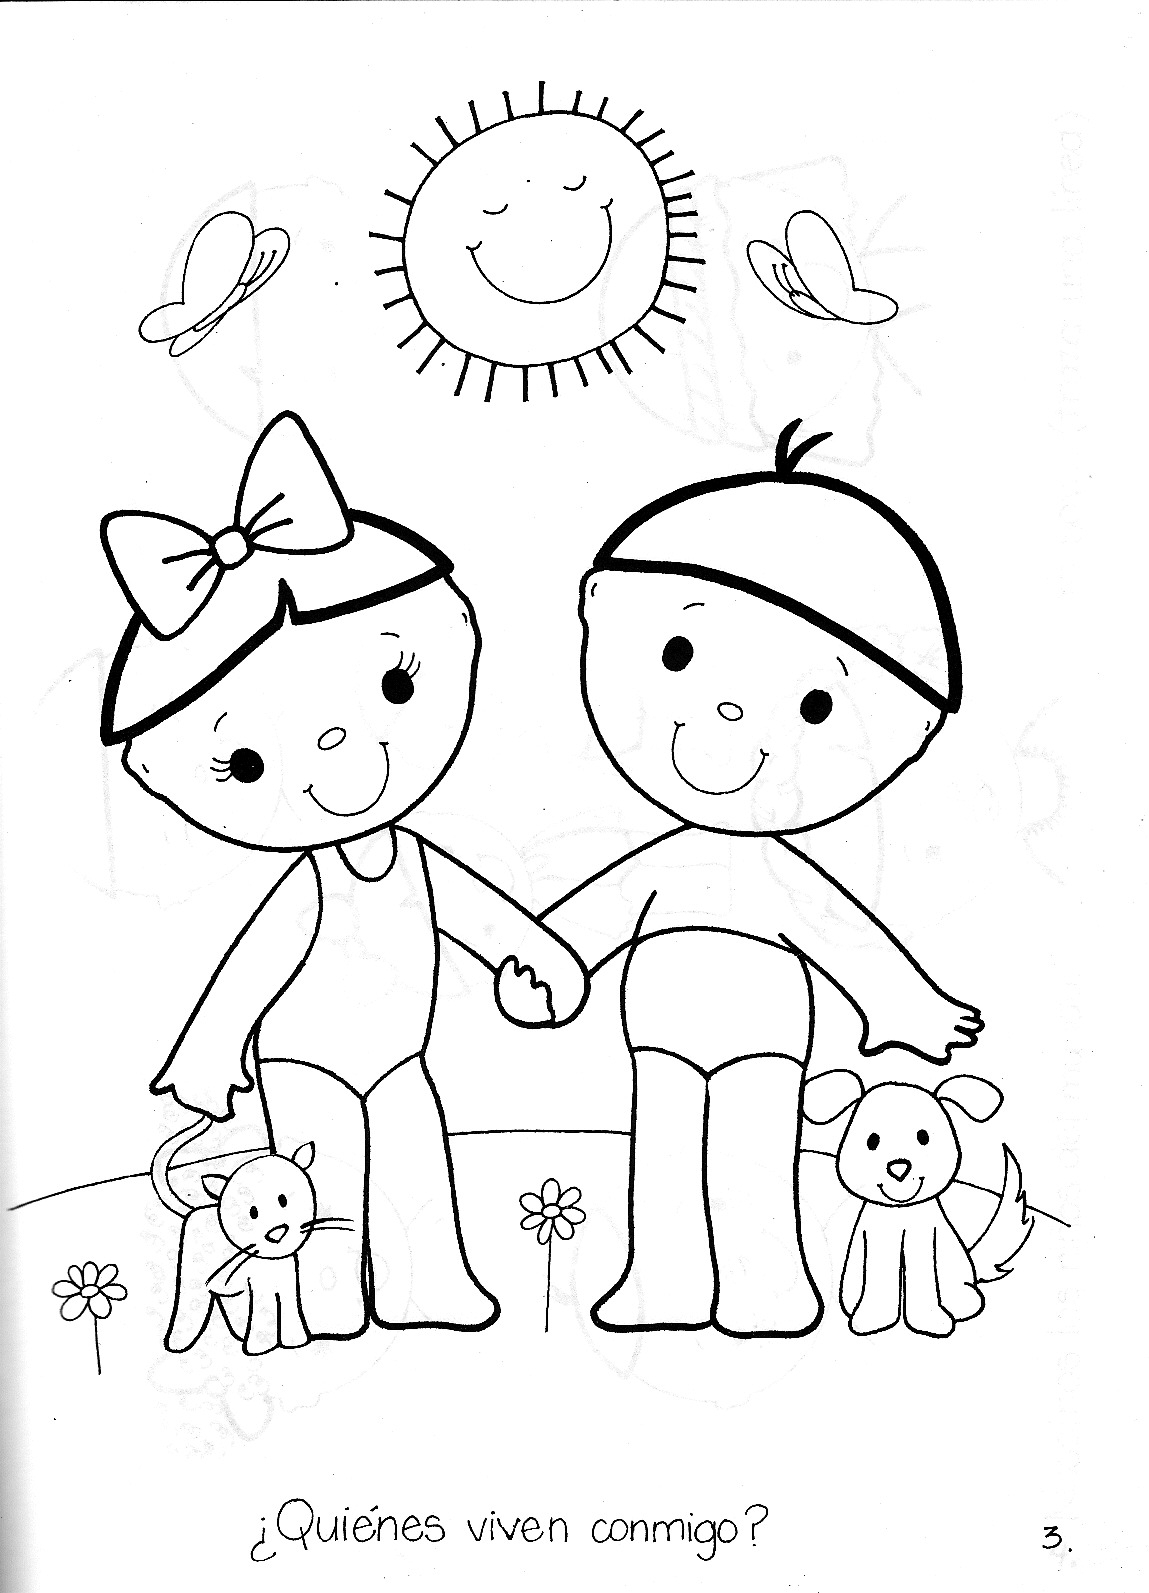 Tareas para imprimir para niños - Dibujos para colorear - IMAGIXS